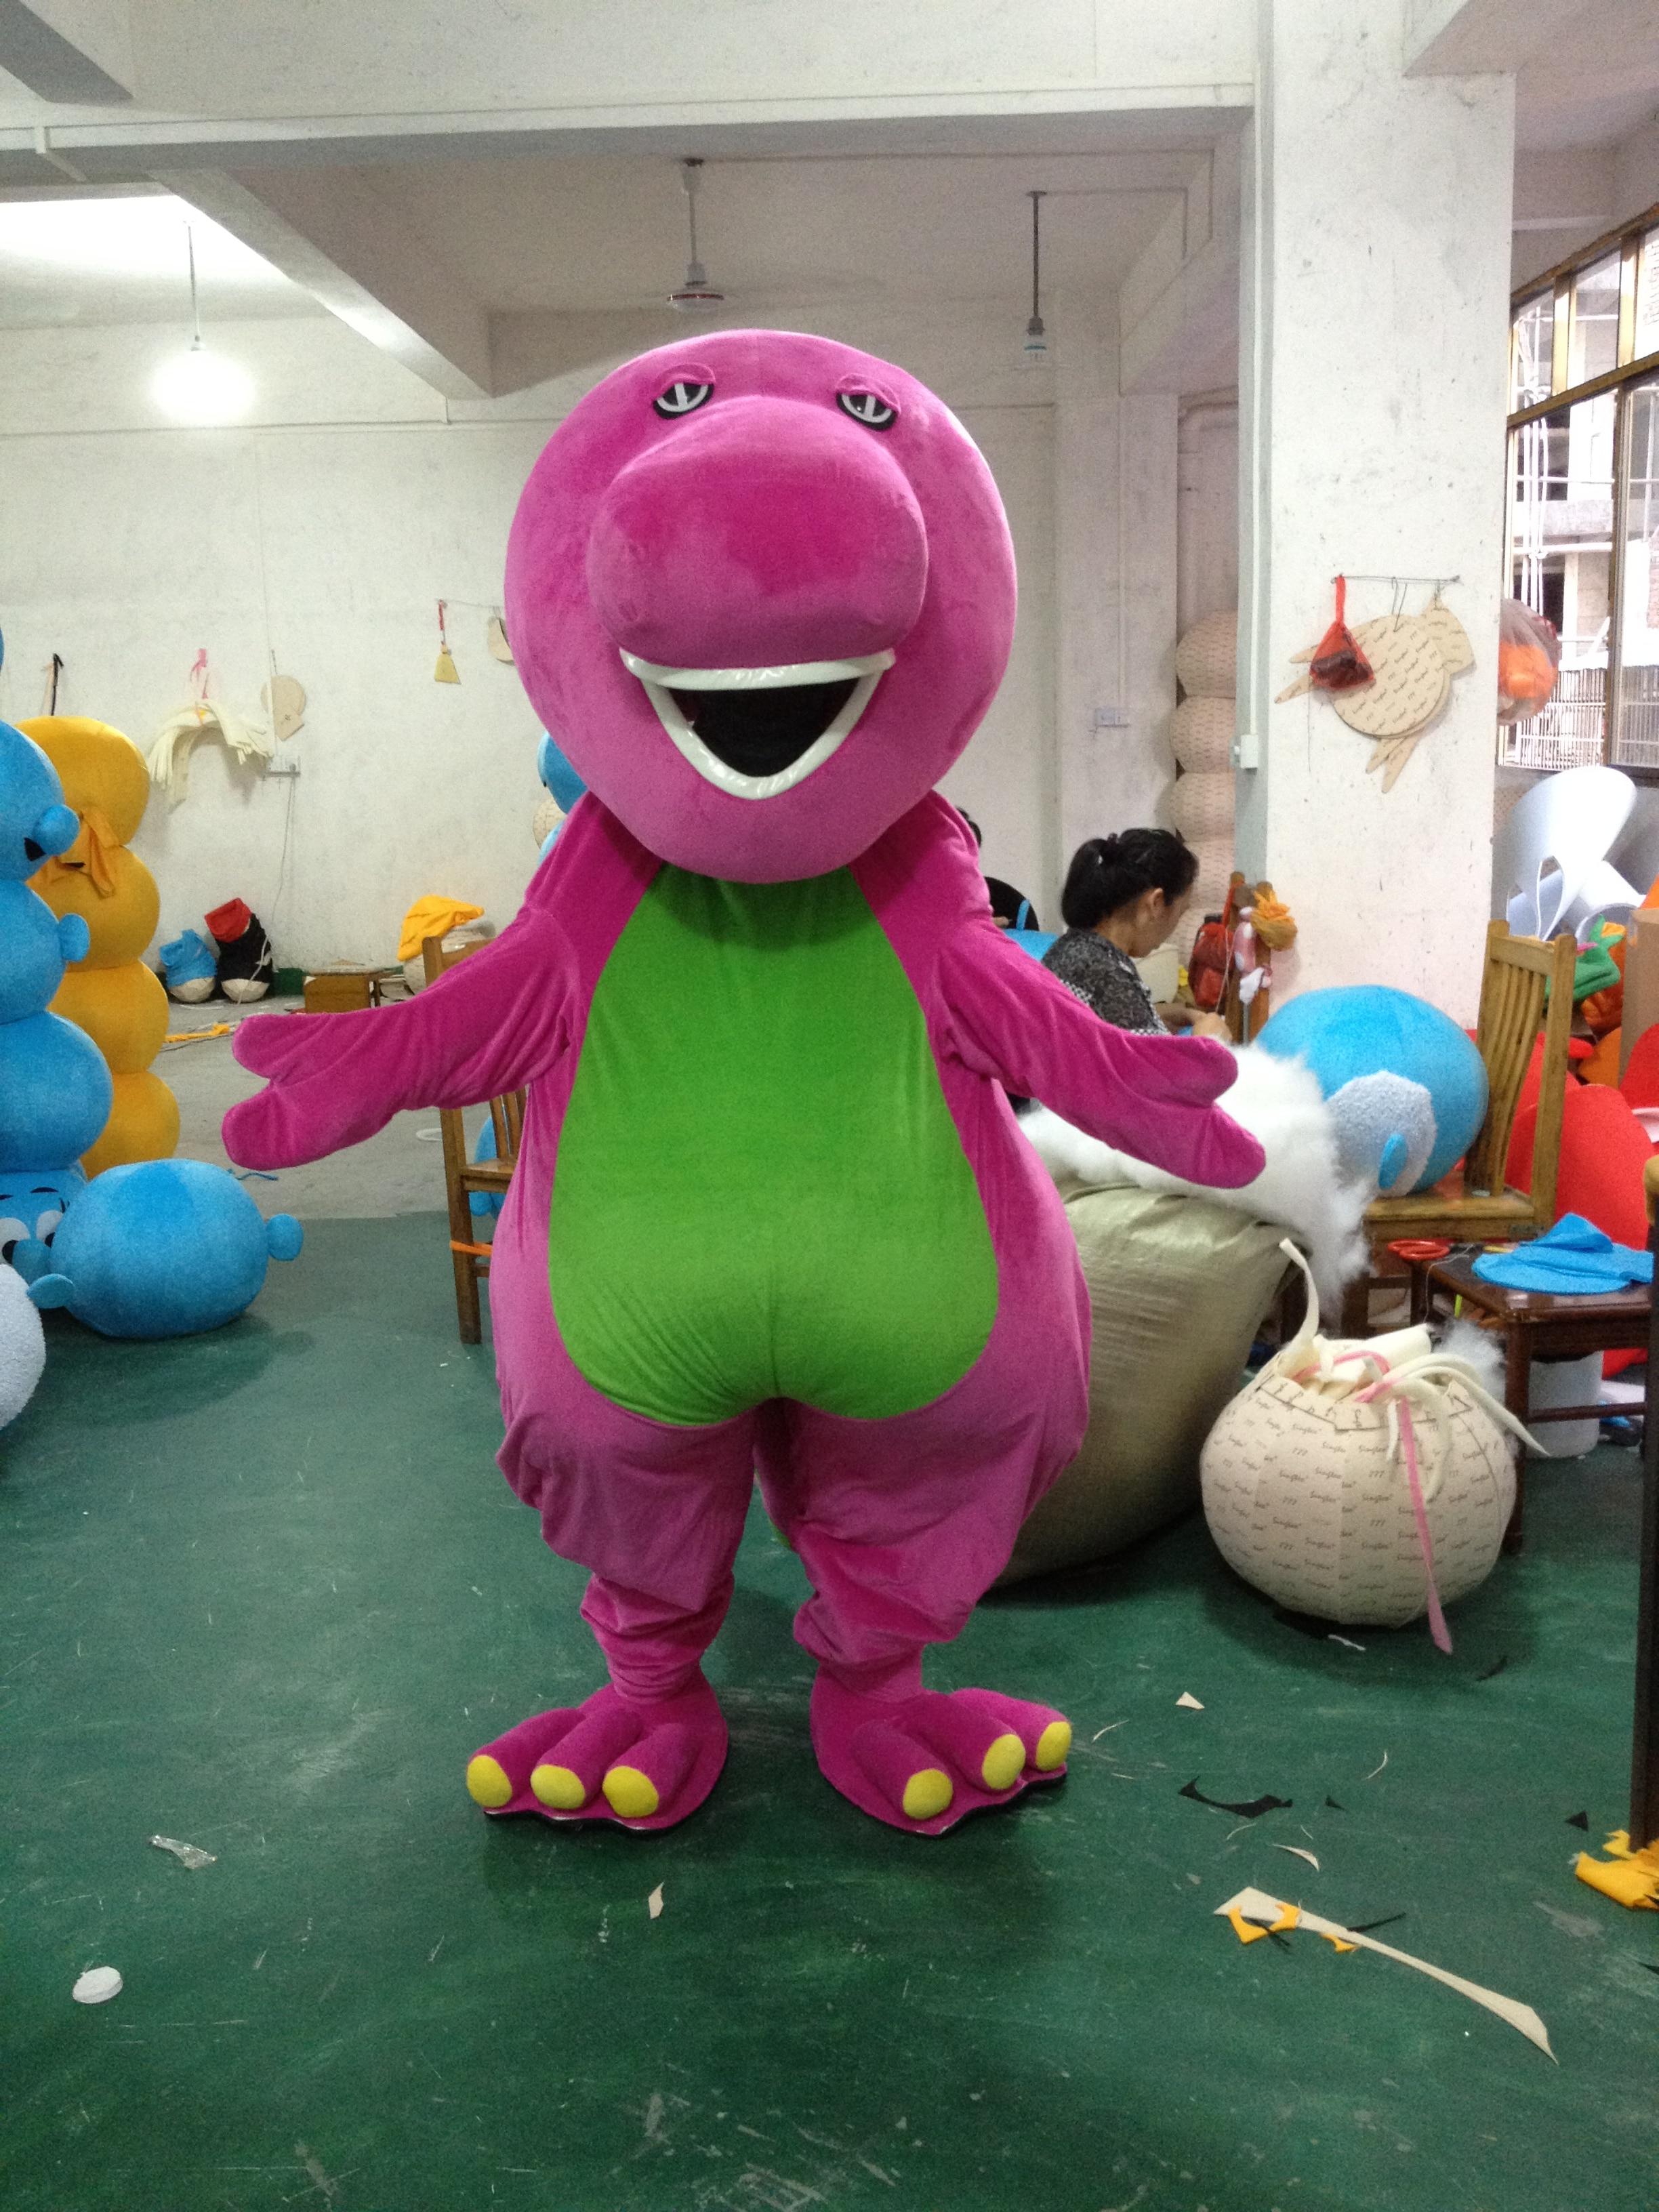 Purple Dinosaurs Barney Baby Bop Bob and BJ Dinosaur Cartoon